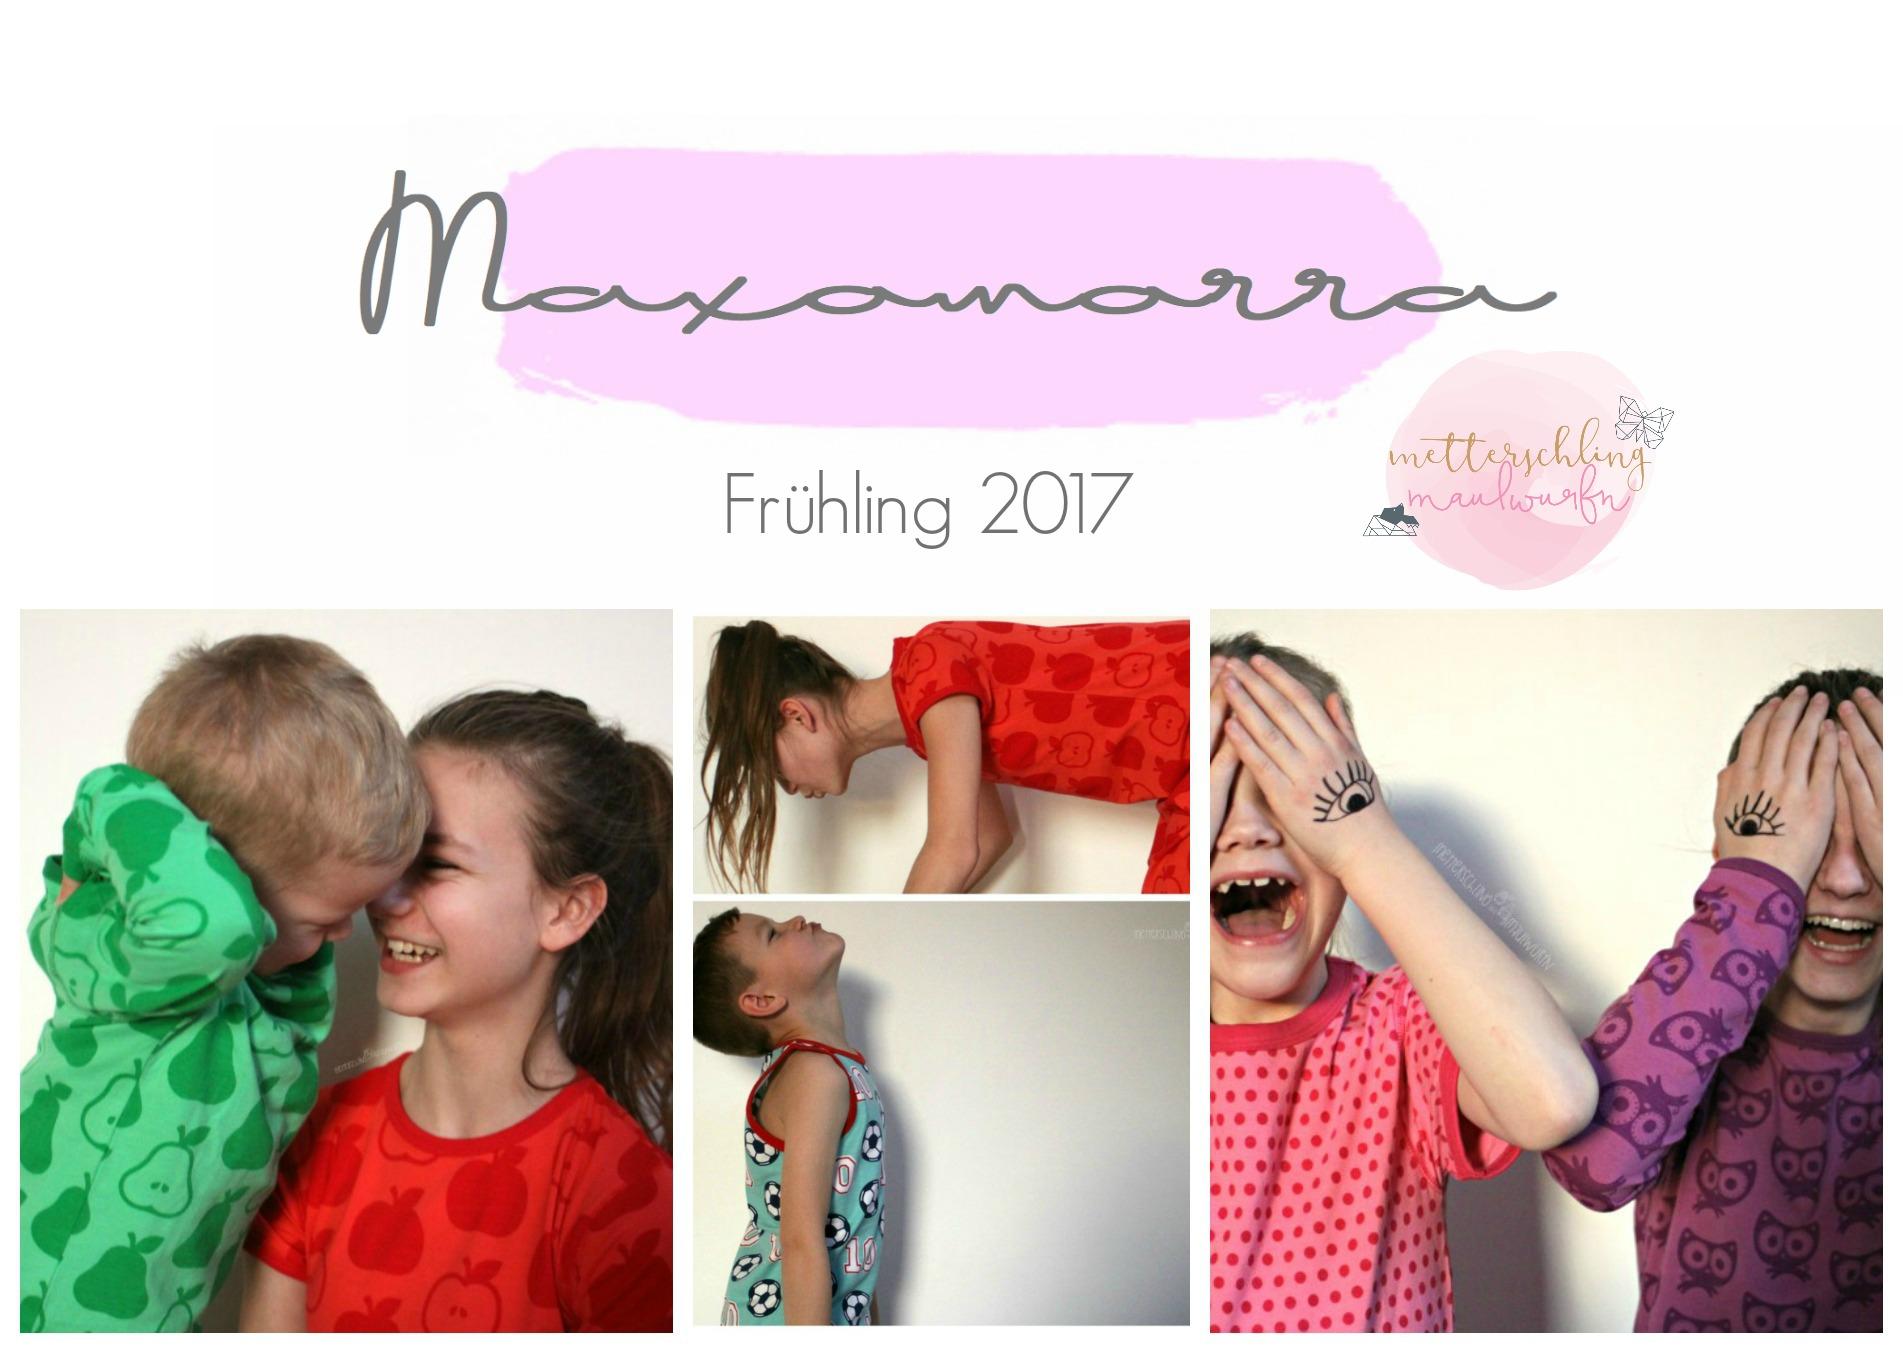 Maxomorro Frühling